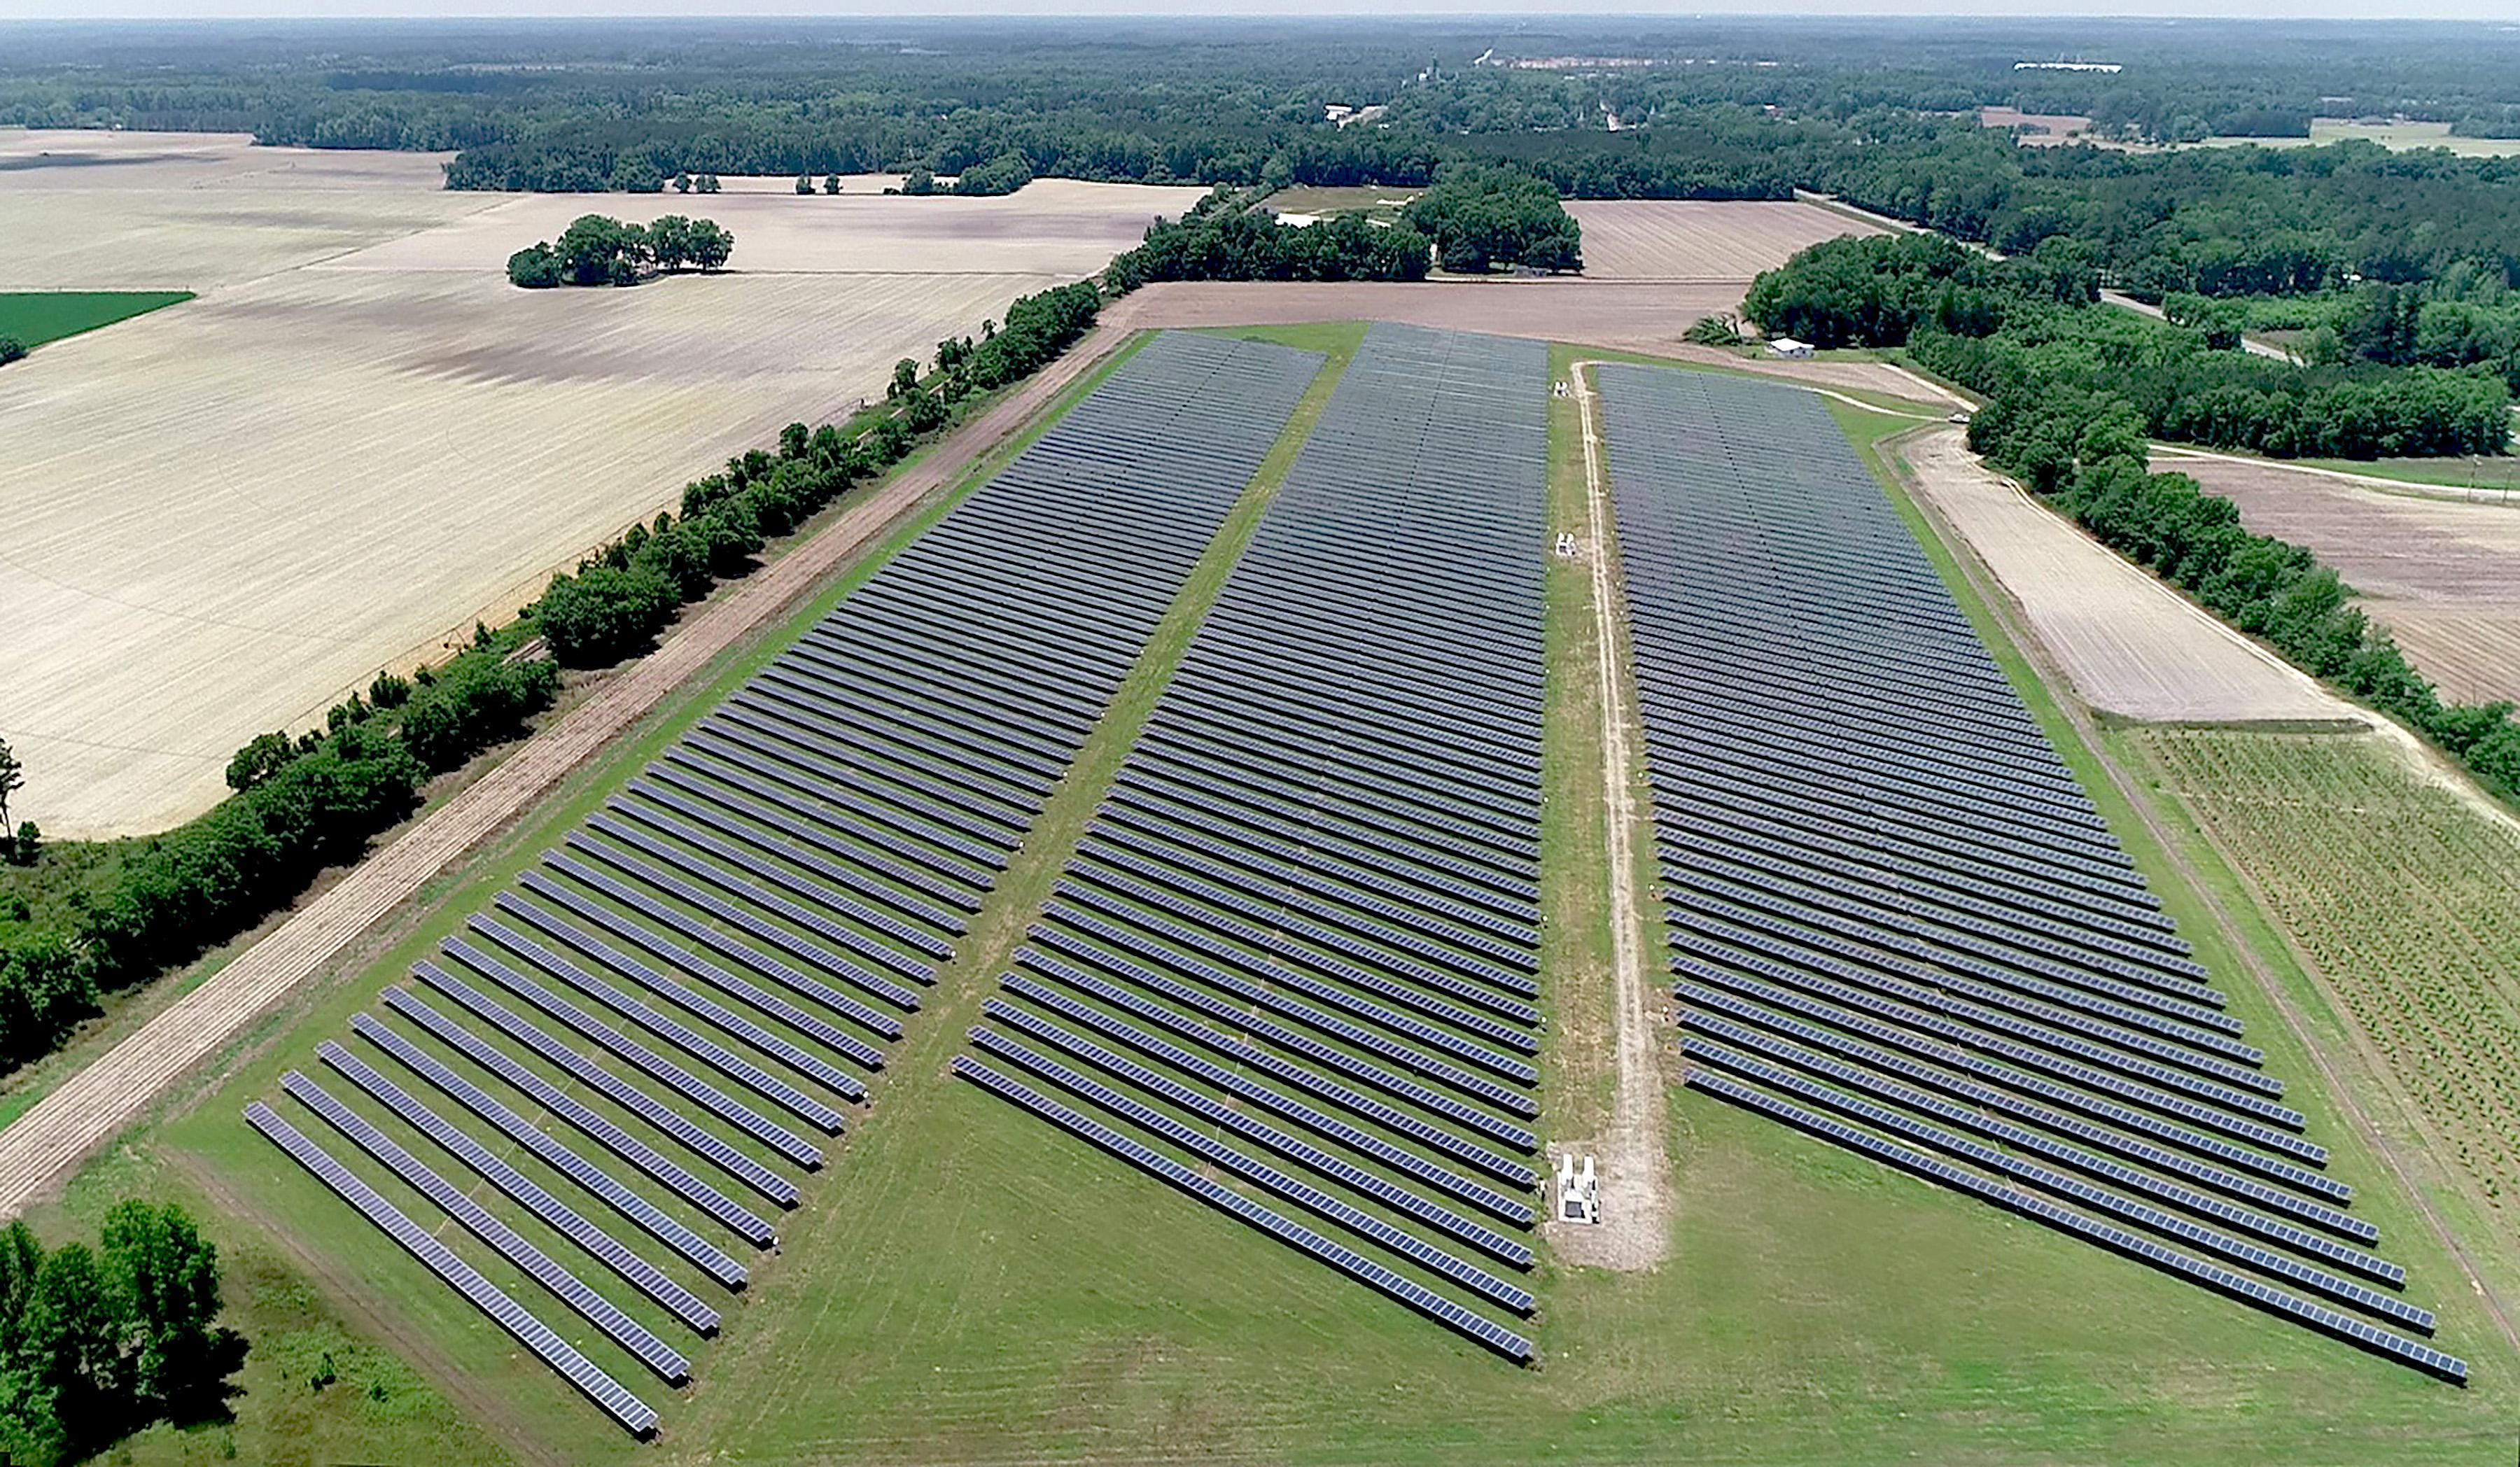 RPCS solar tracker